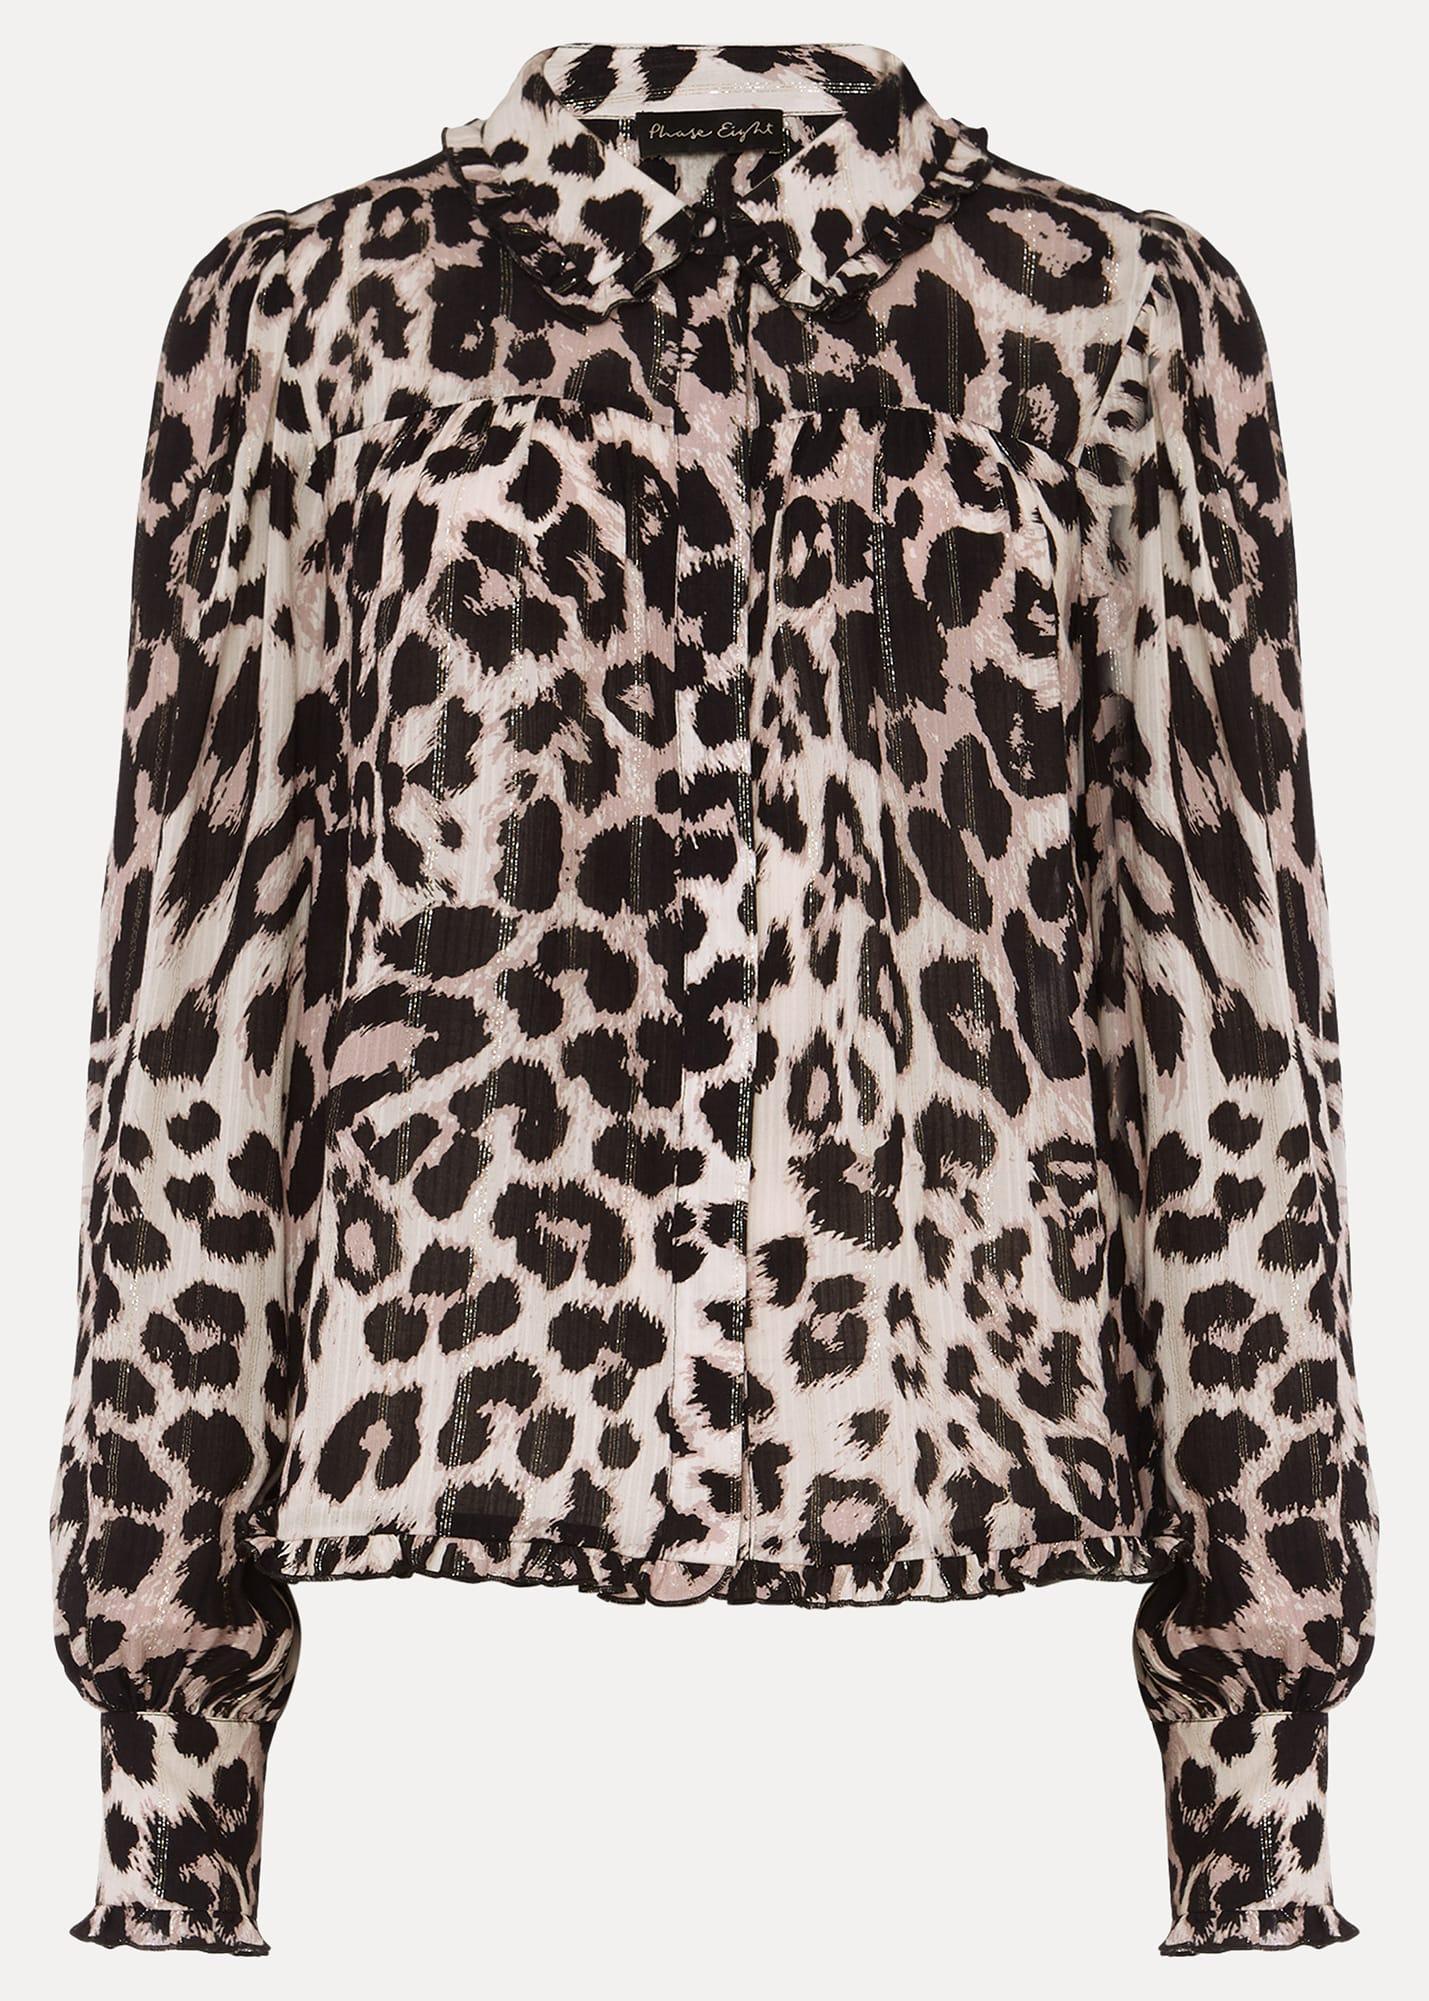 Phase Eight Women Chelsie Leopard Print Blouse